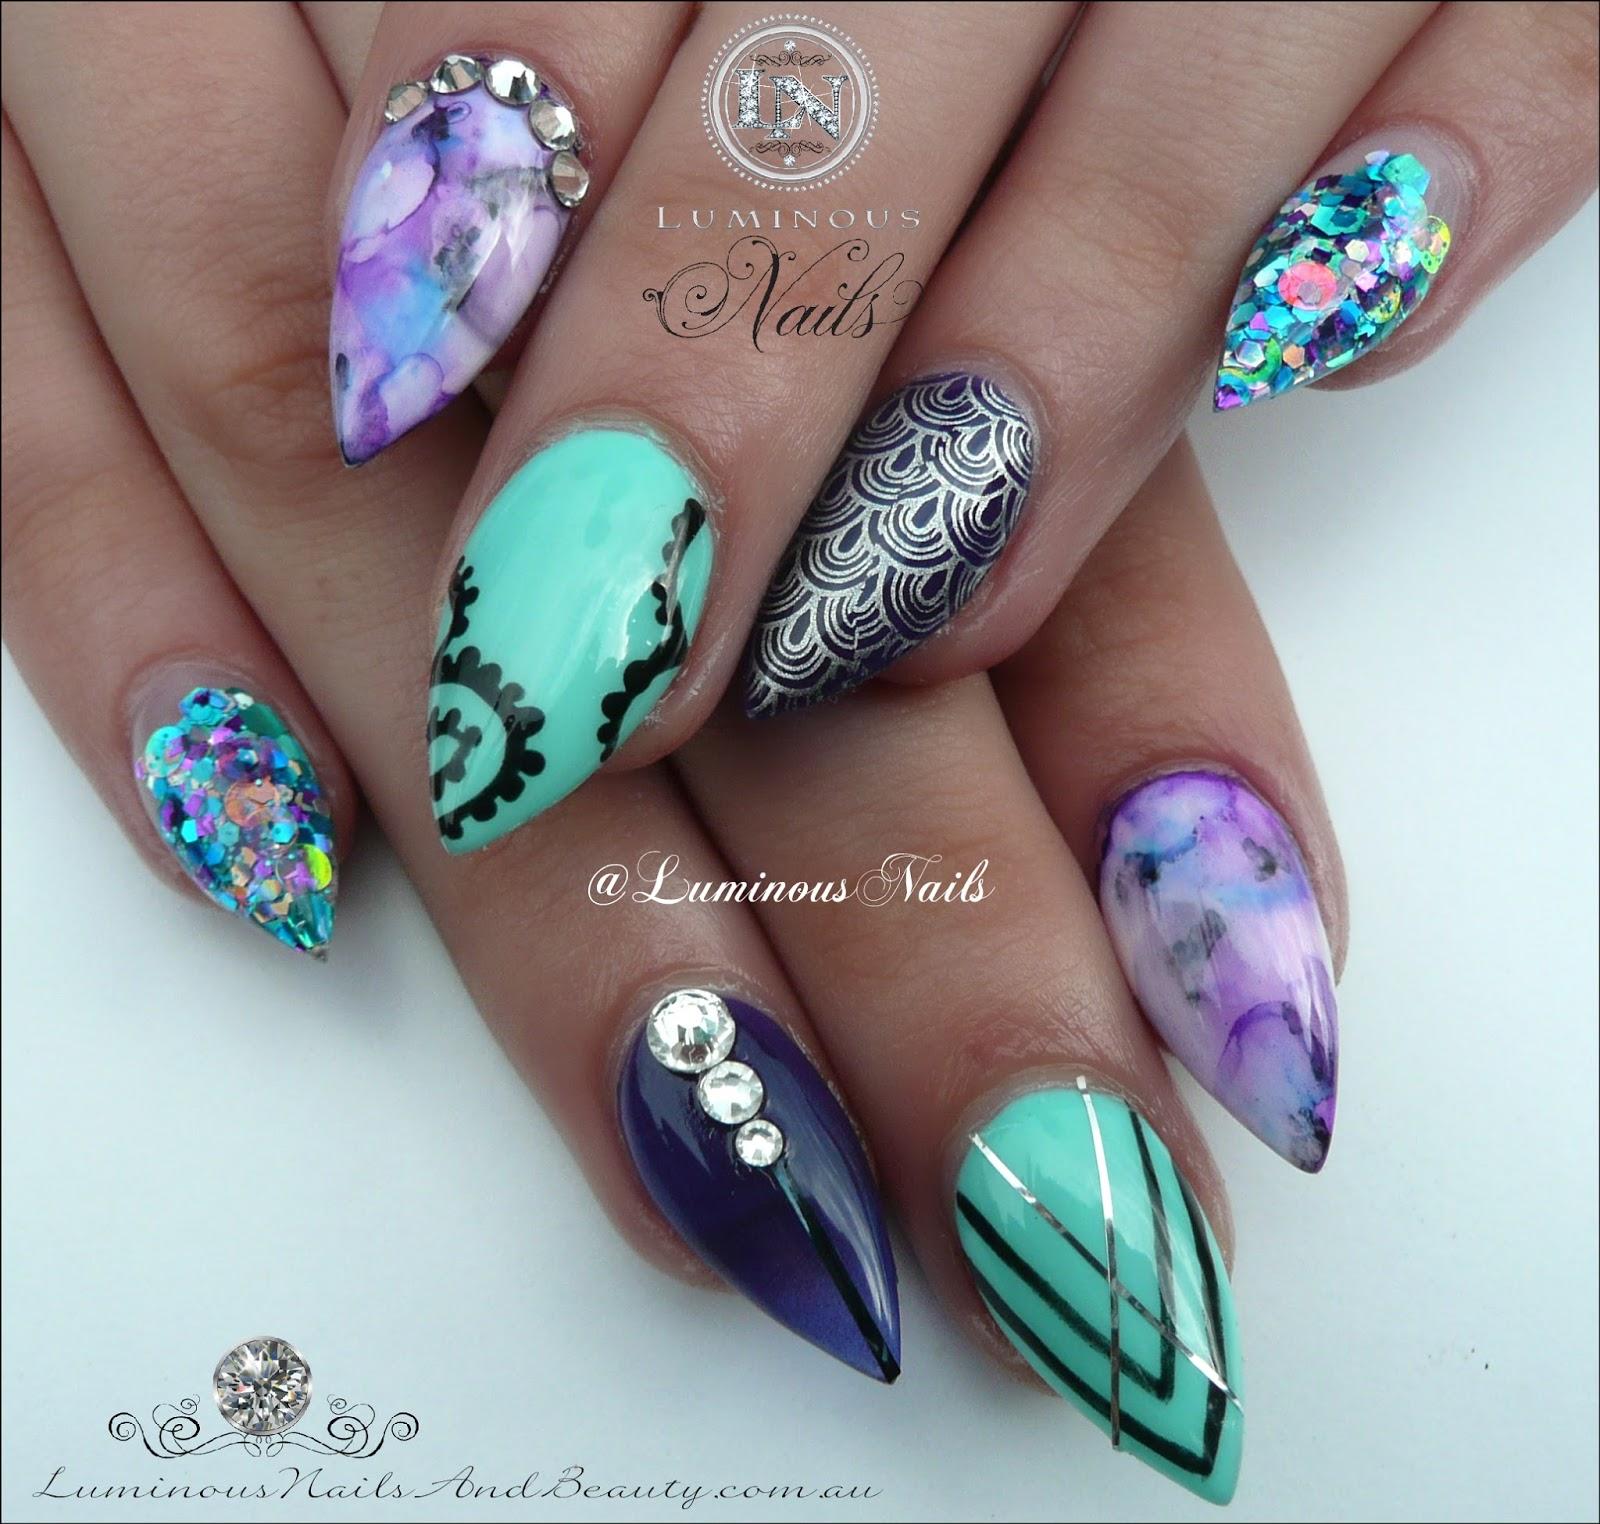 Mermaid Nail Art Acrylic Nails: Luminous Nails: Atlantic Mermaid Inspired Acrylic Nails